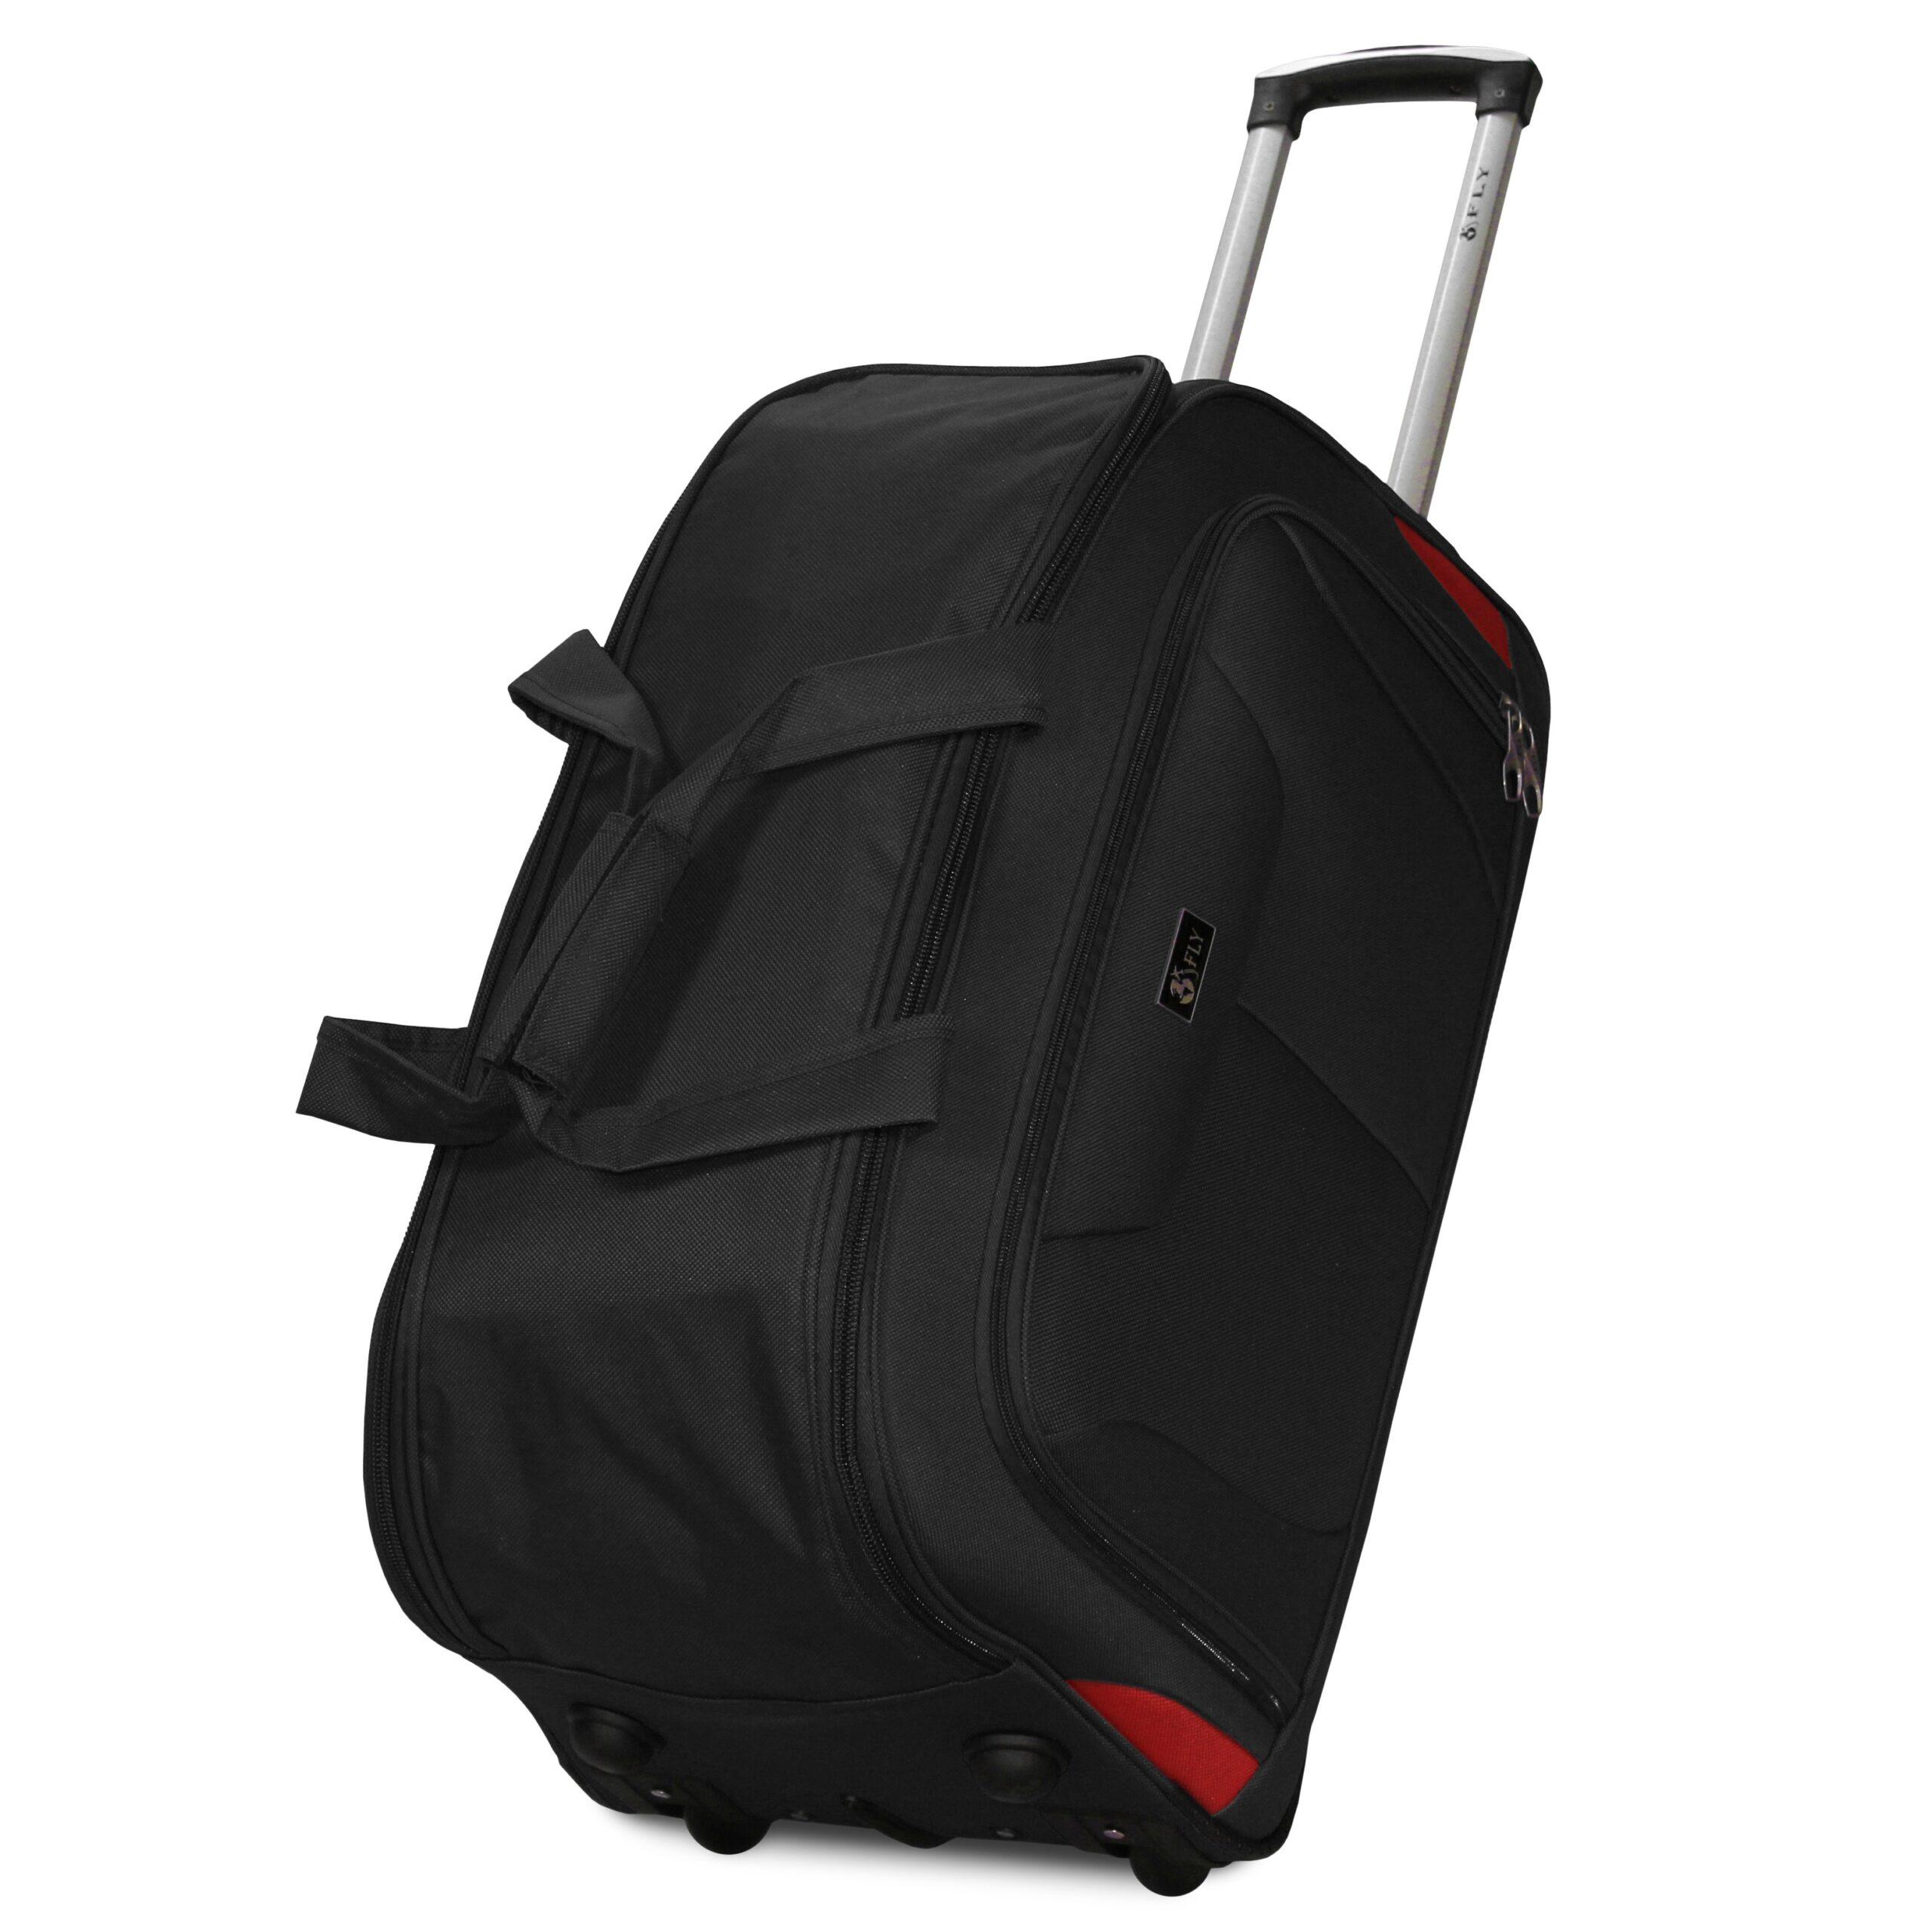 Средняя сумка (M) на 2 колесах | Fly 2611 | тканевая